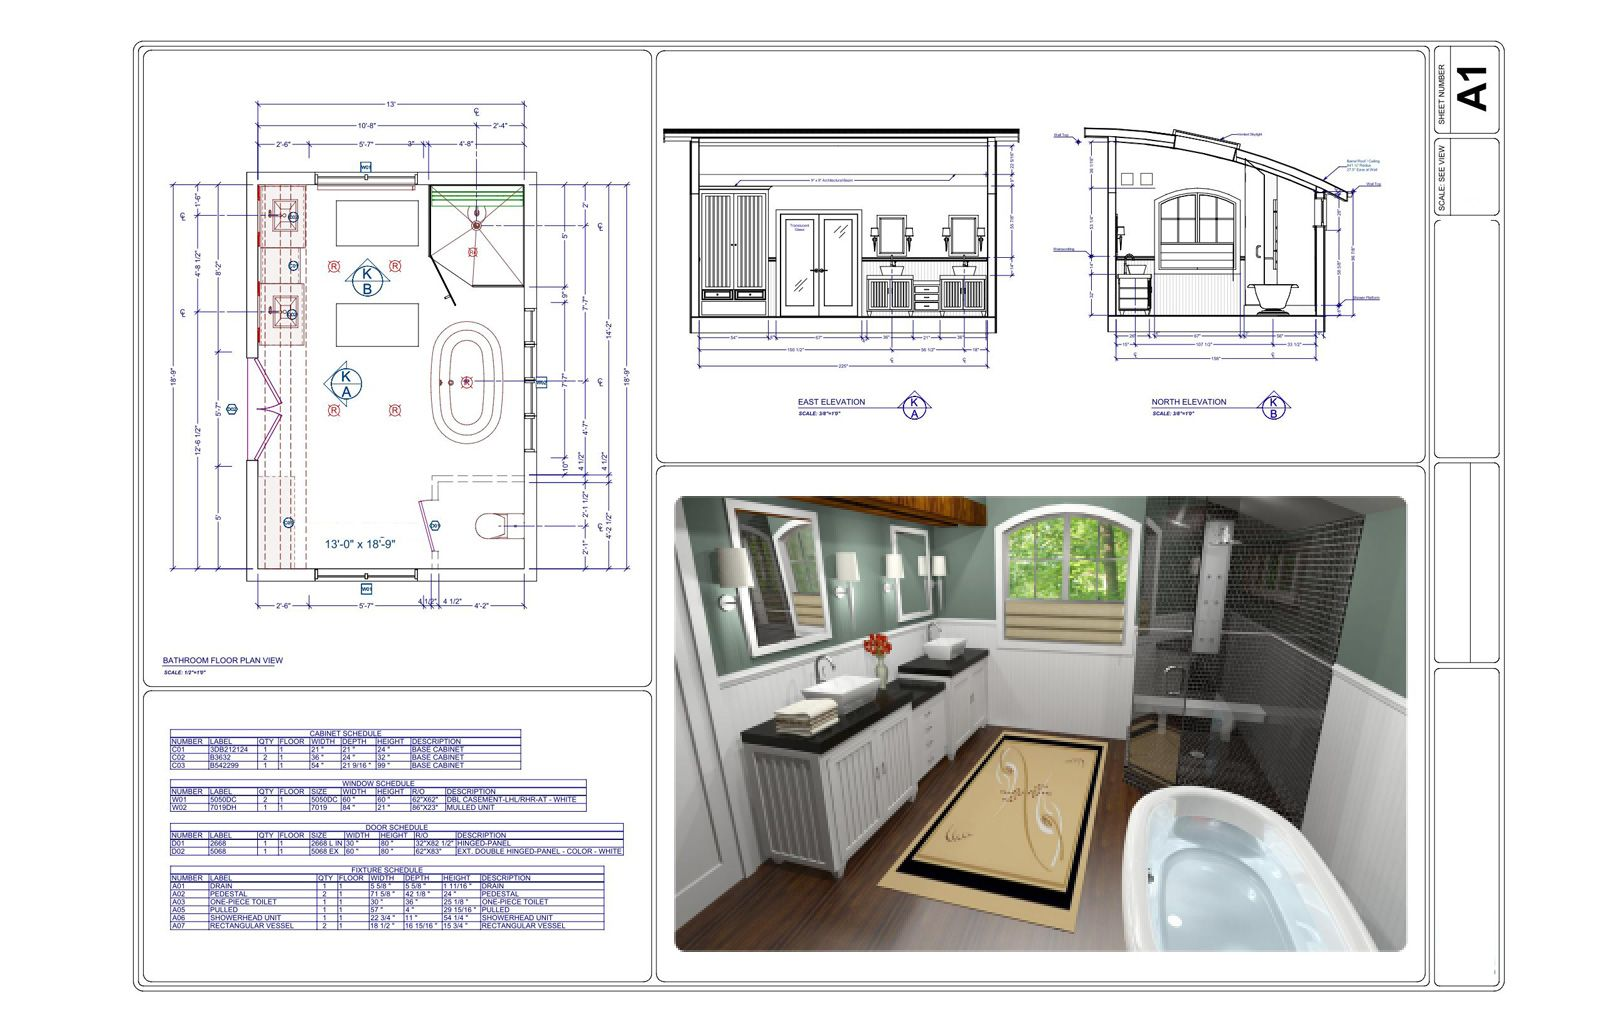 Designe Pro Kitchen Bathroom Bathroom Design Tool Bathroom Design Layout Bathroom Layout Online bathroom design tool